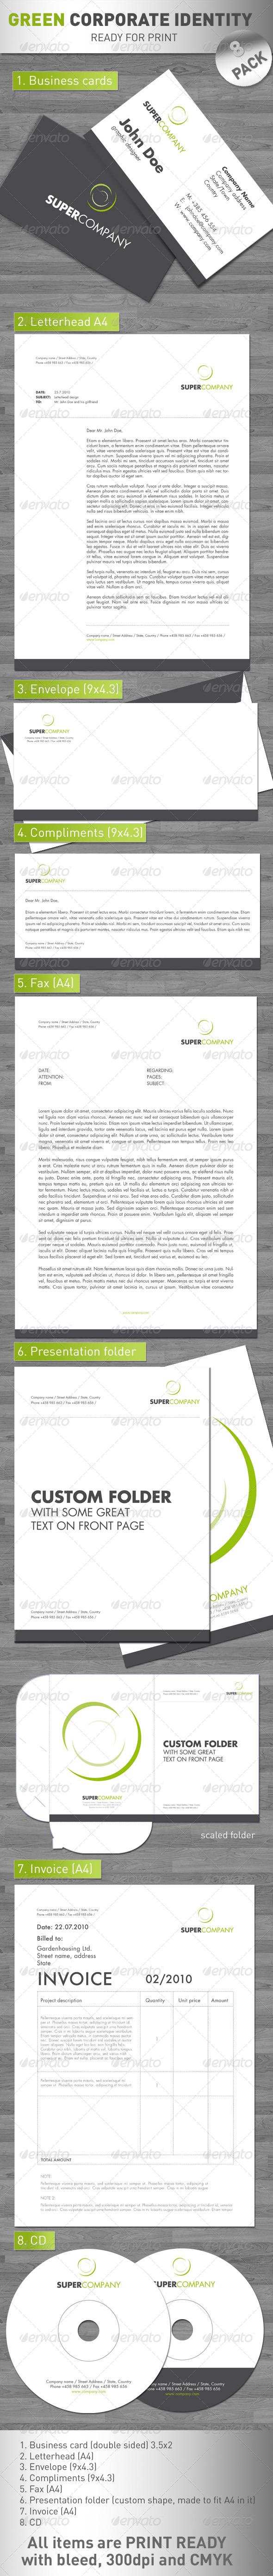 Green Corporate Identity 8 Pack Corporate Identity Custom Folders Print Templates